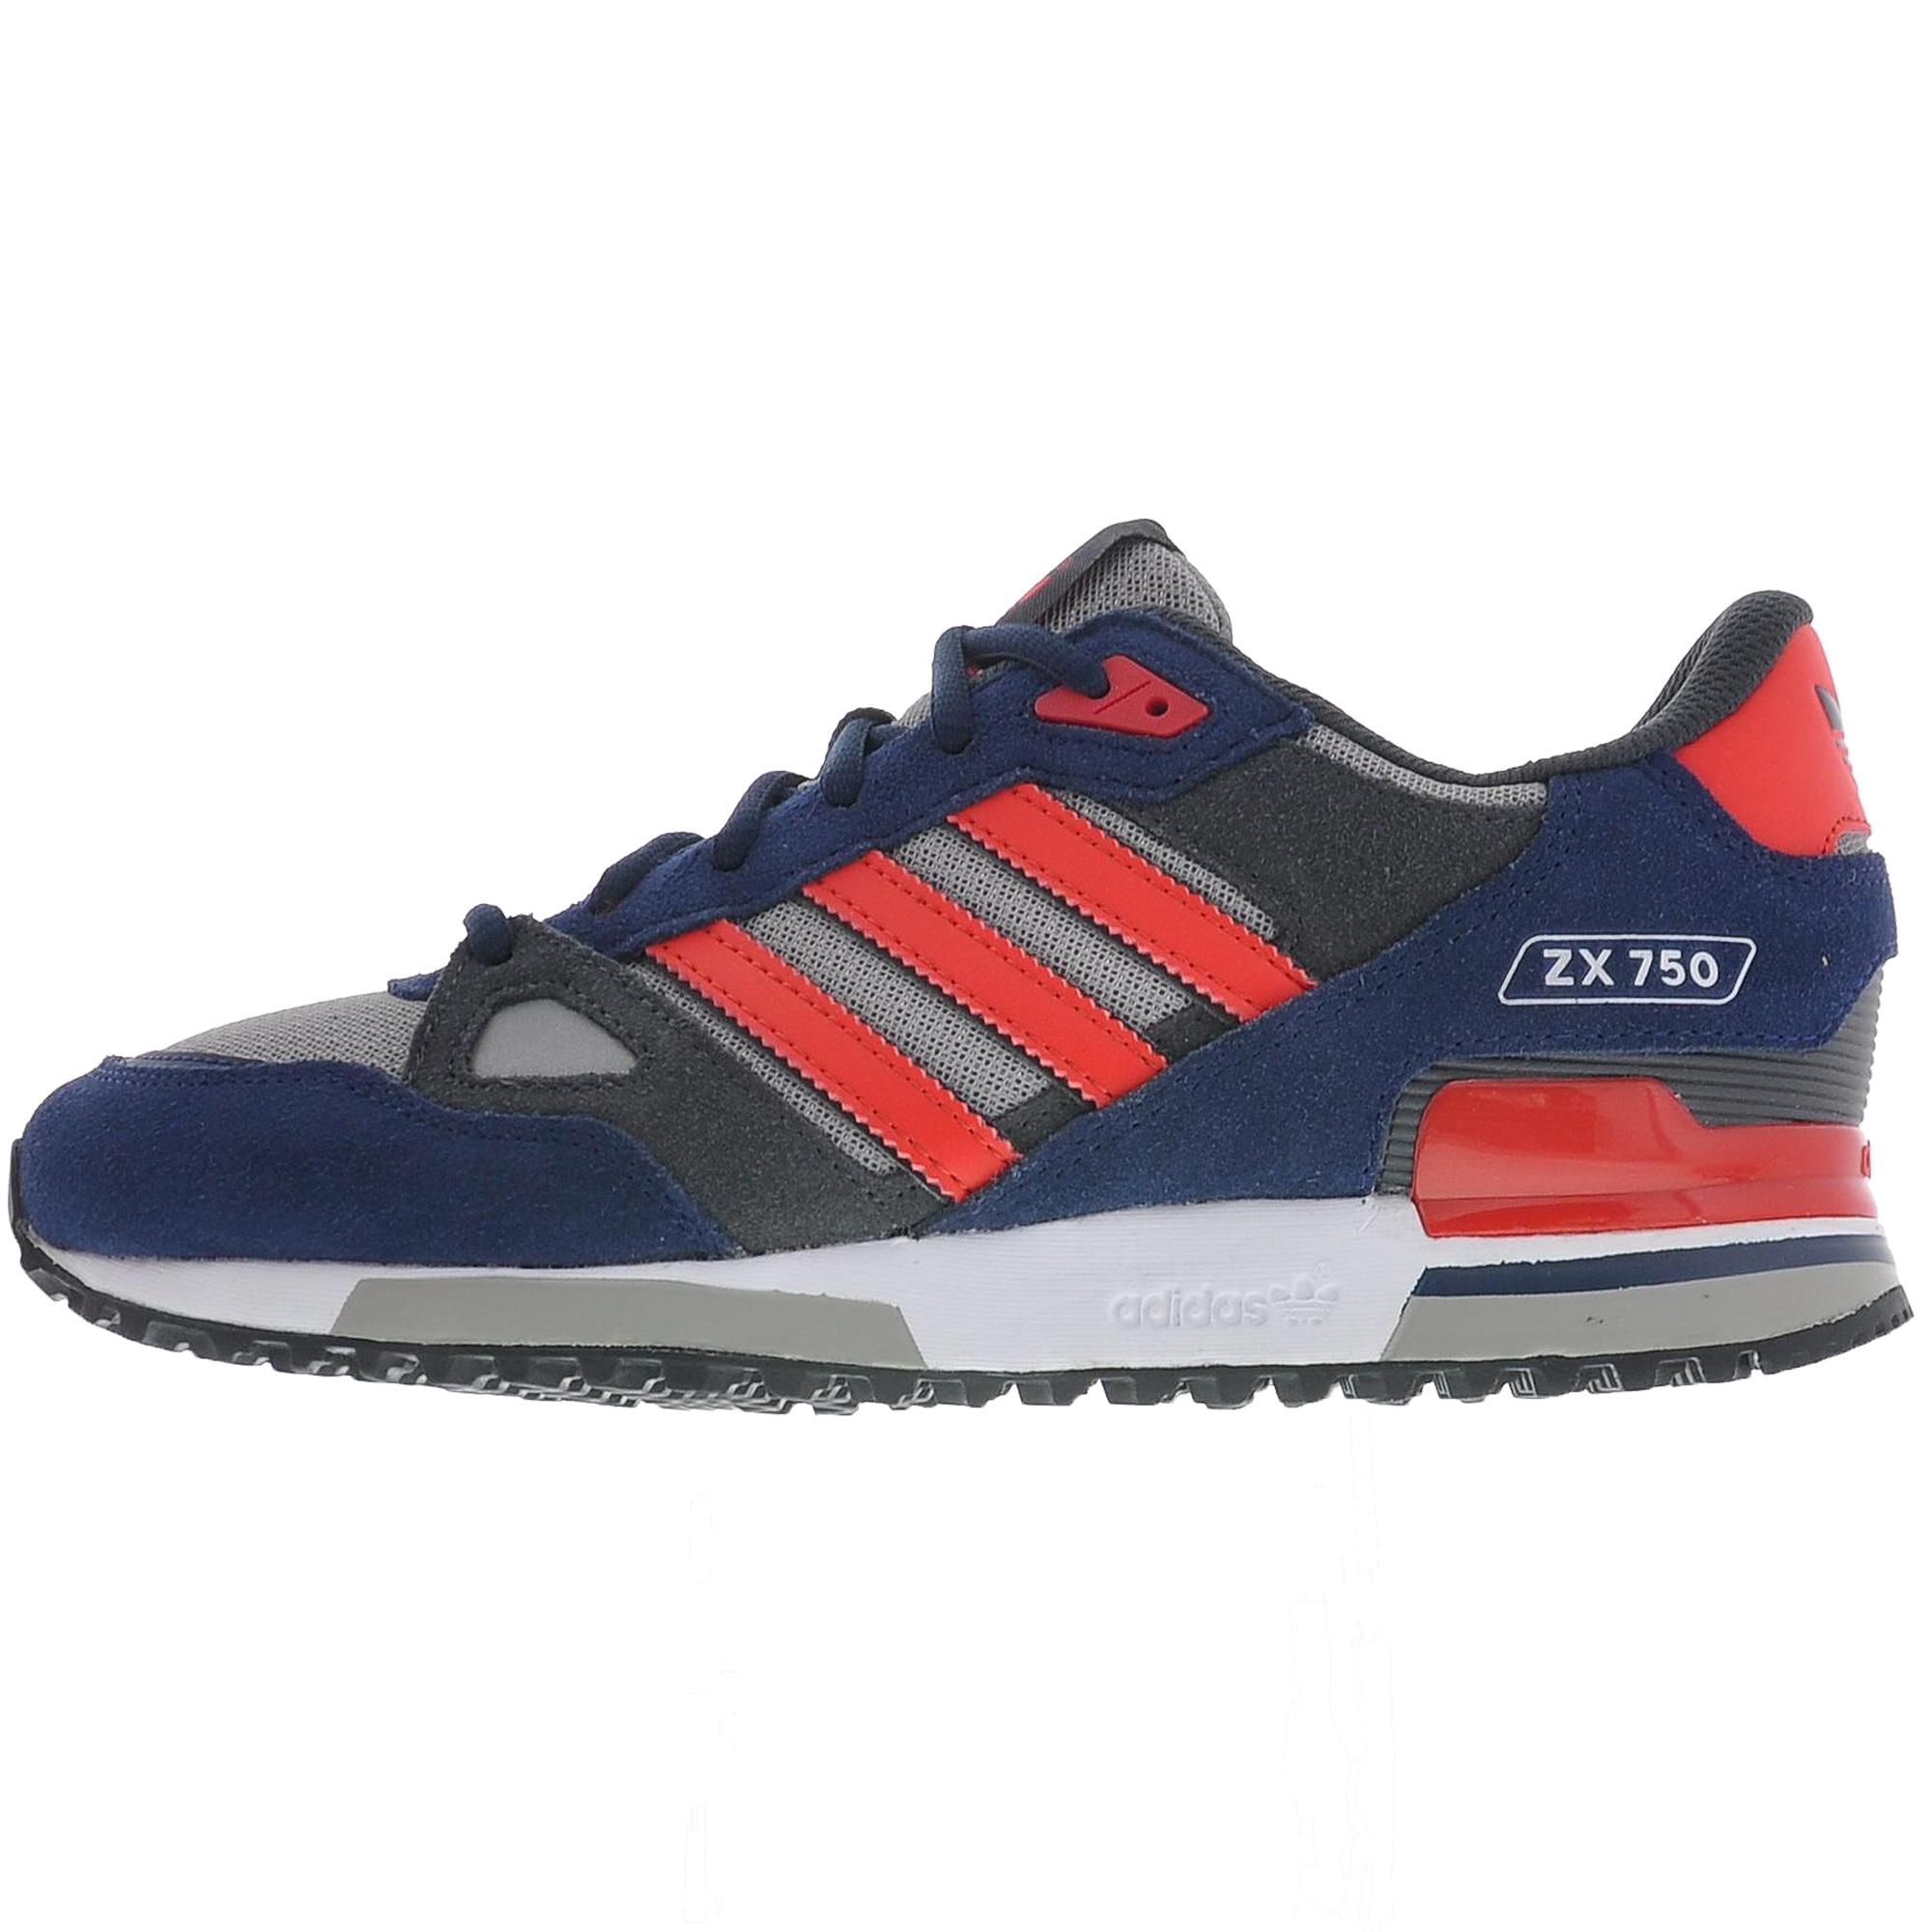 adidas zx 700 lacivert